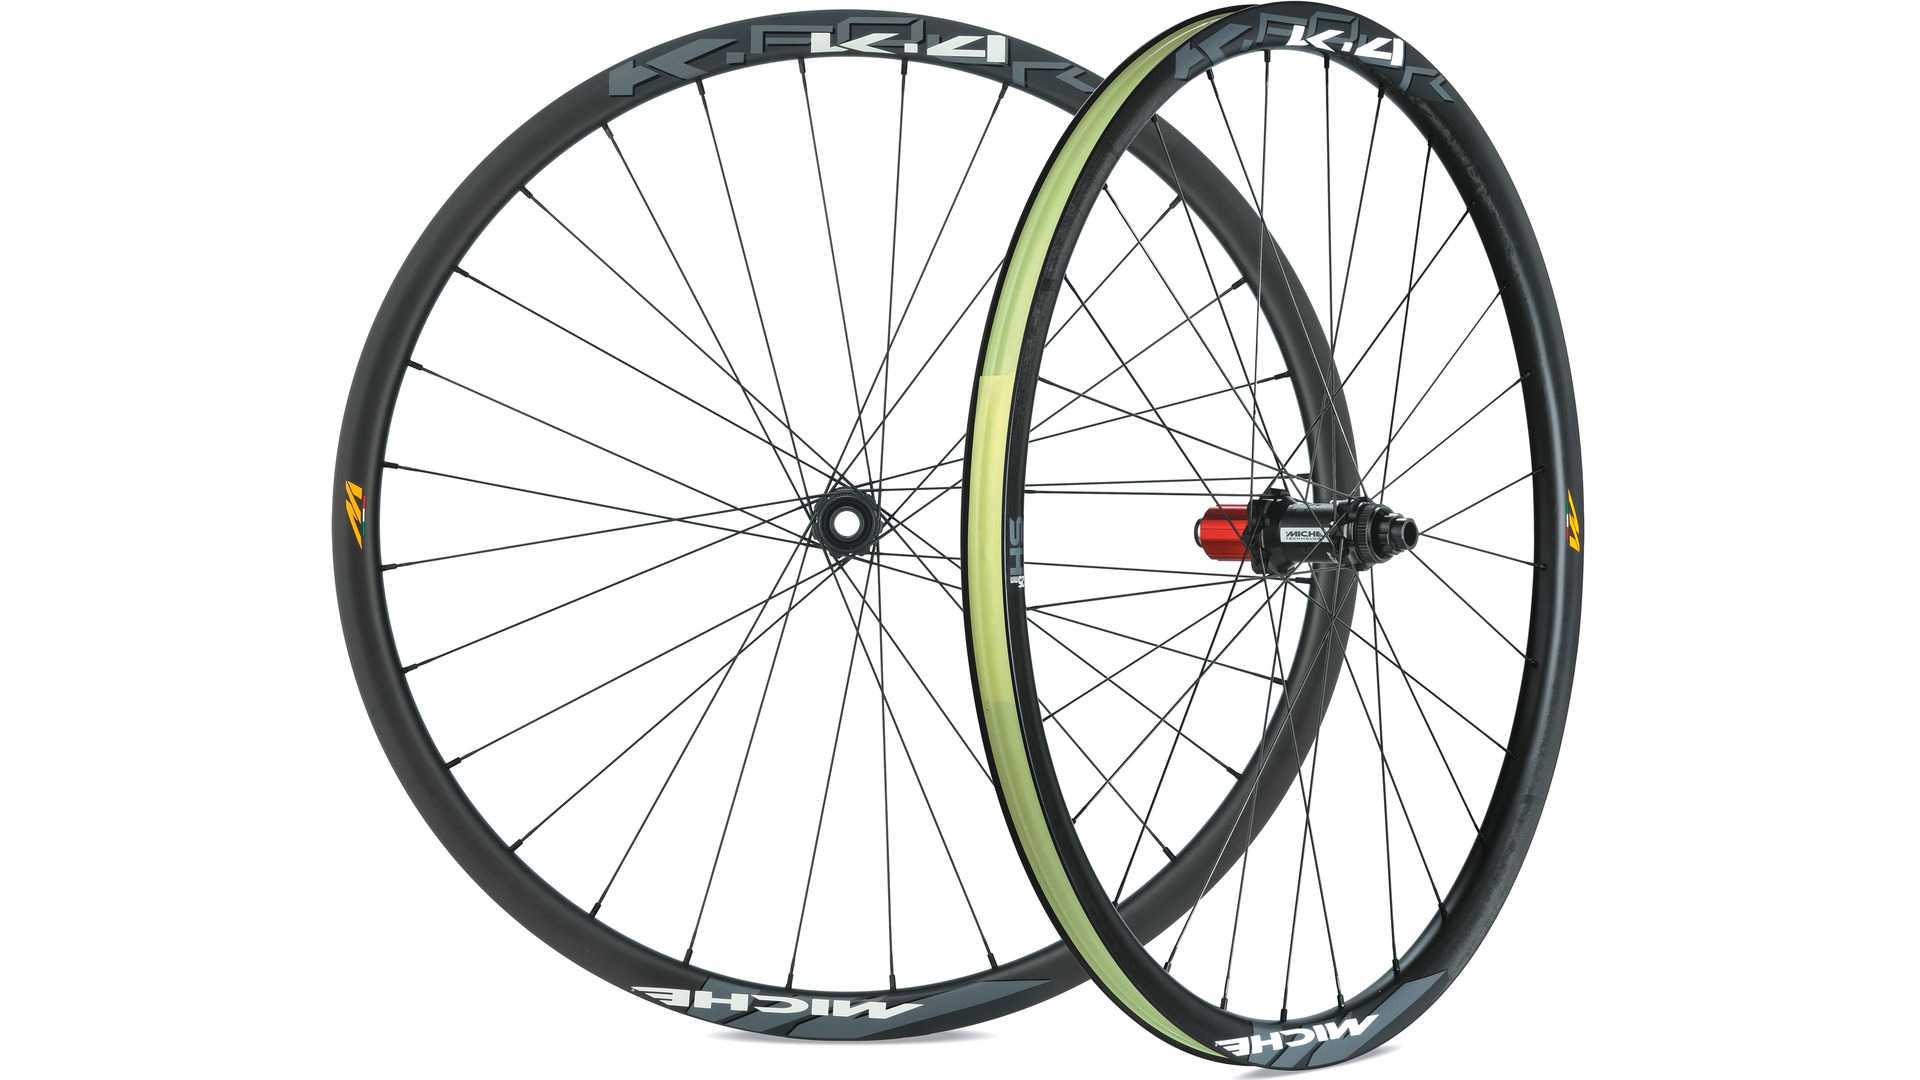 Miche Wheel Set K 4 29 For Tubeless Boost Standard Whk4b0b